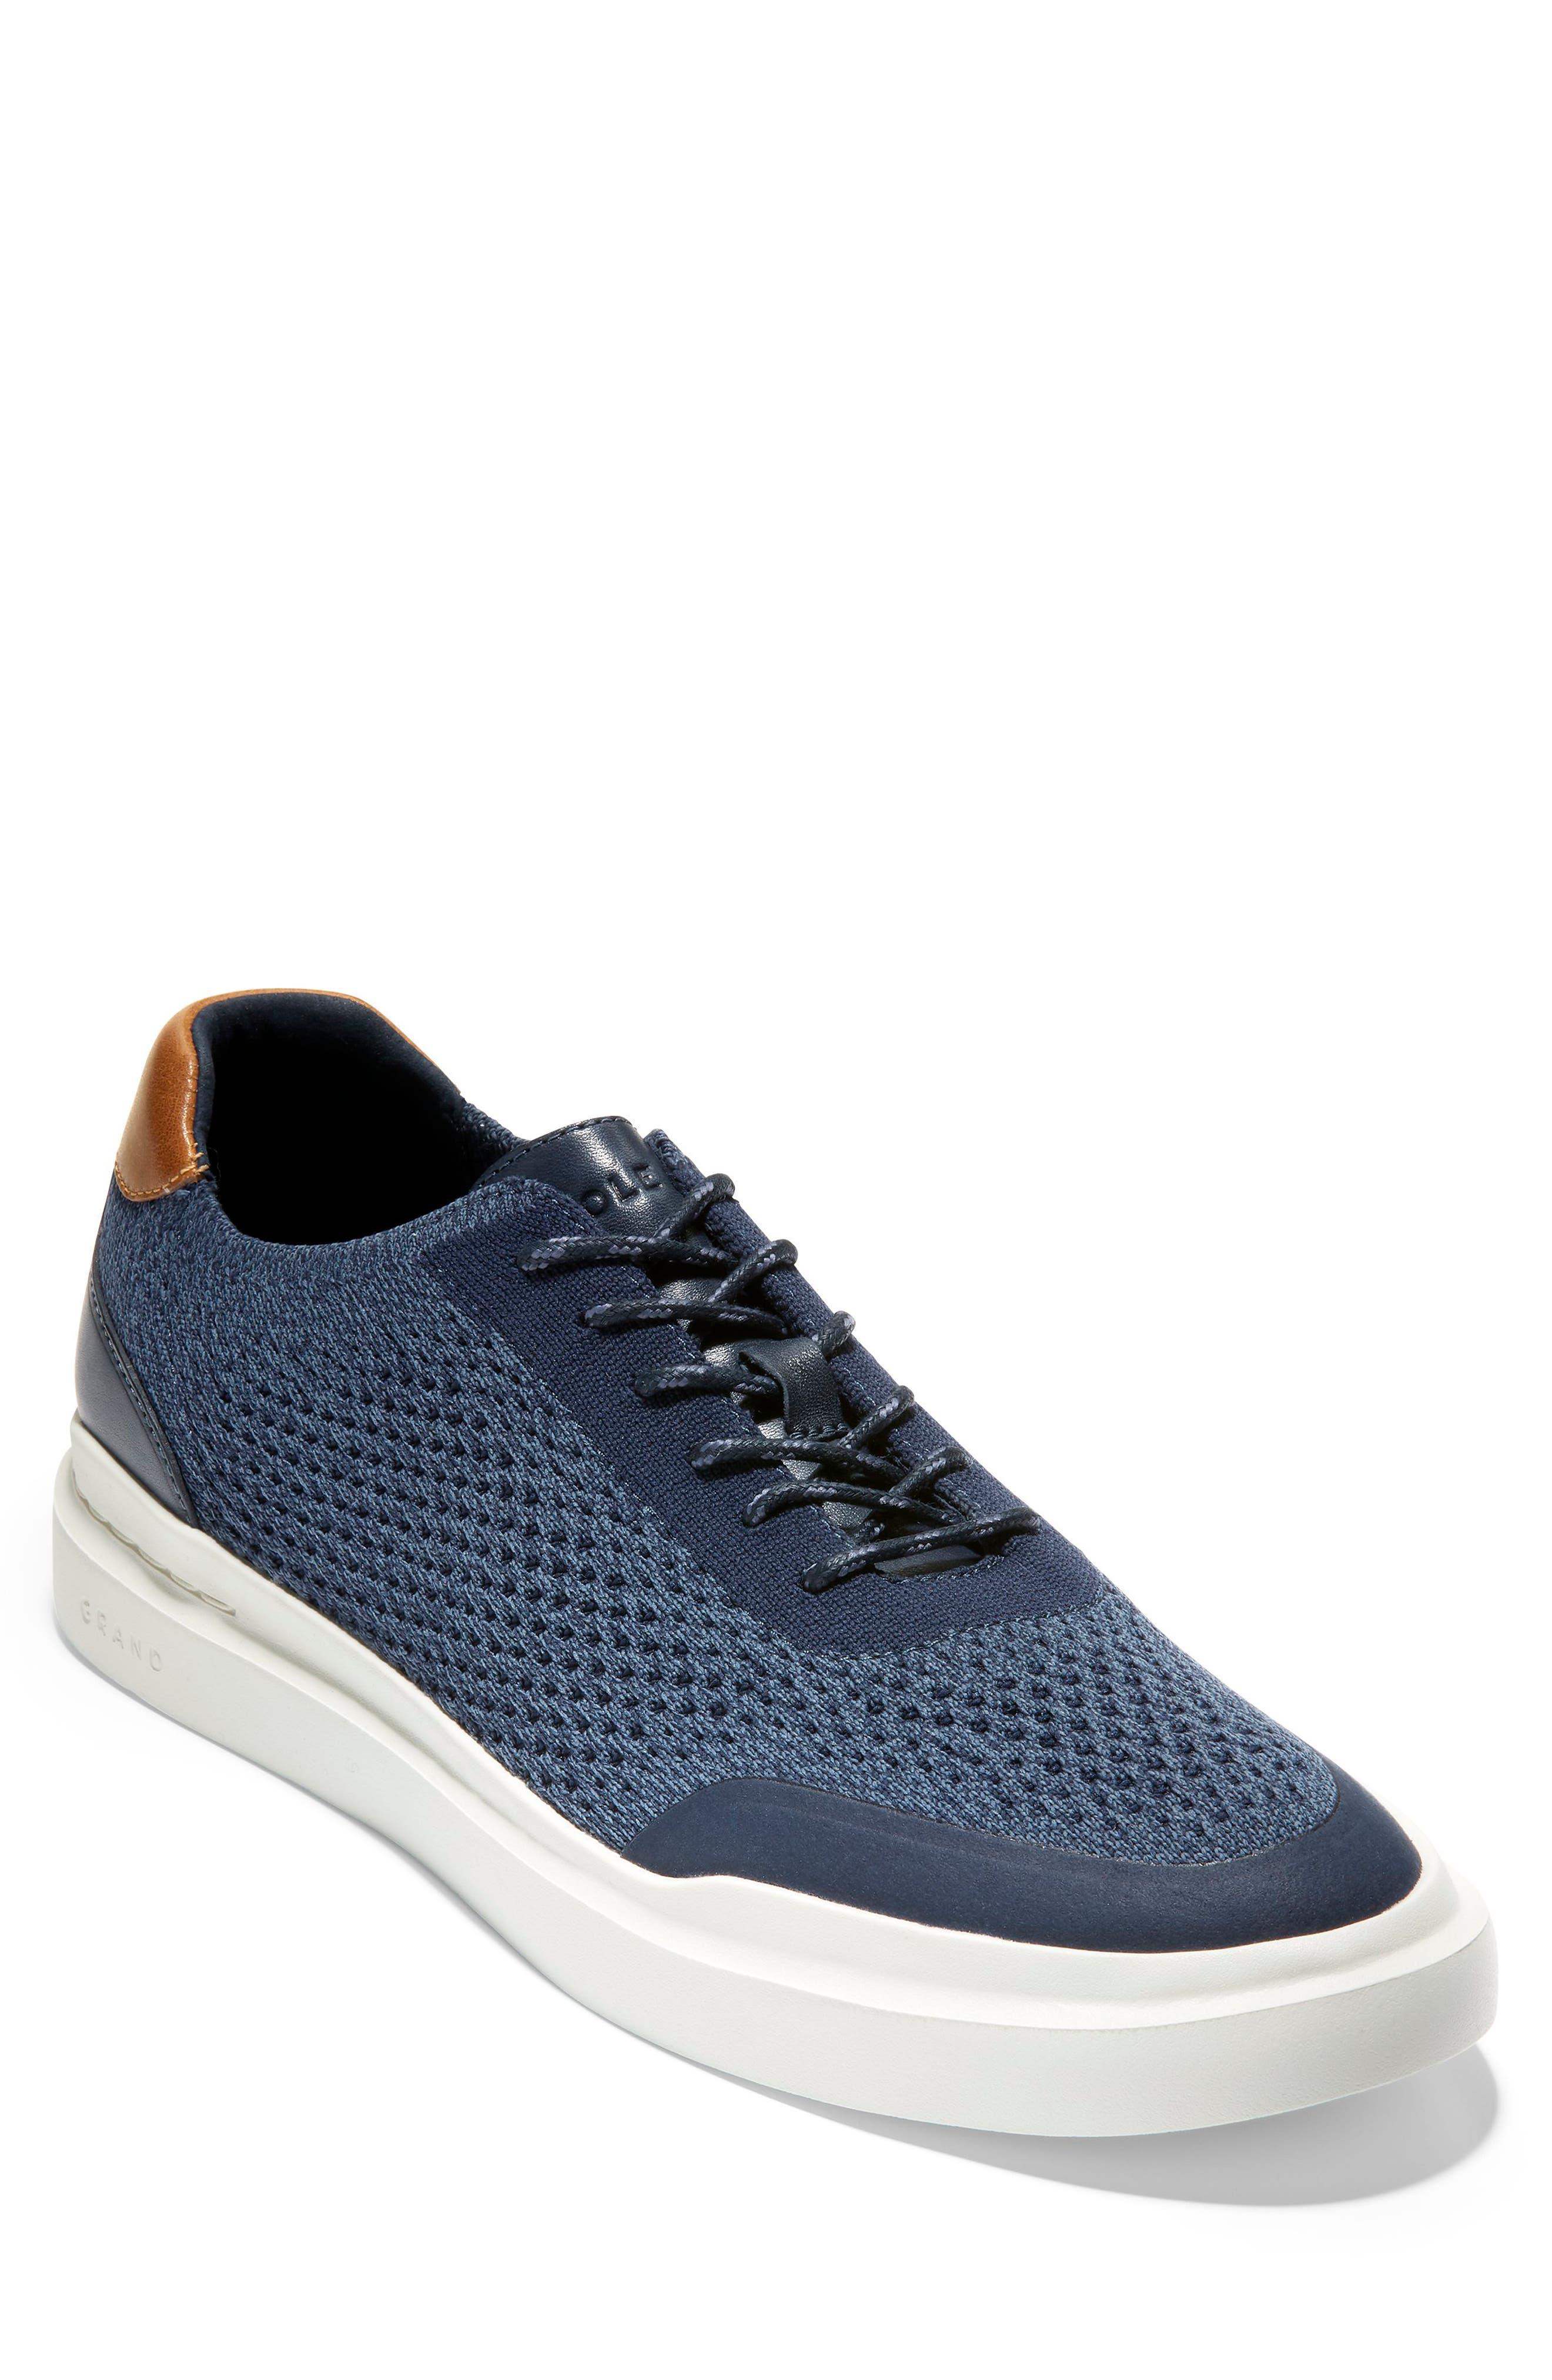 Grandpro Stitchlite Sneaker